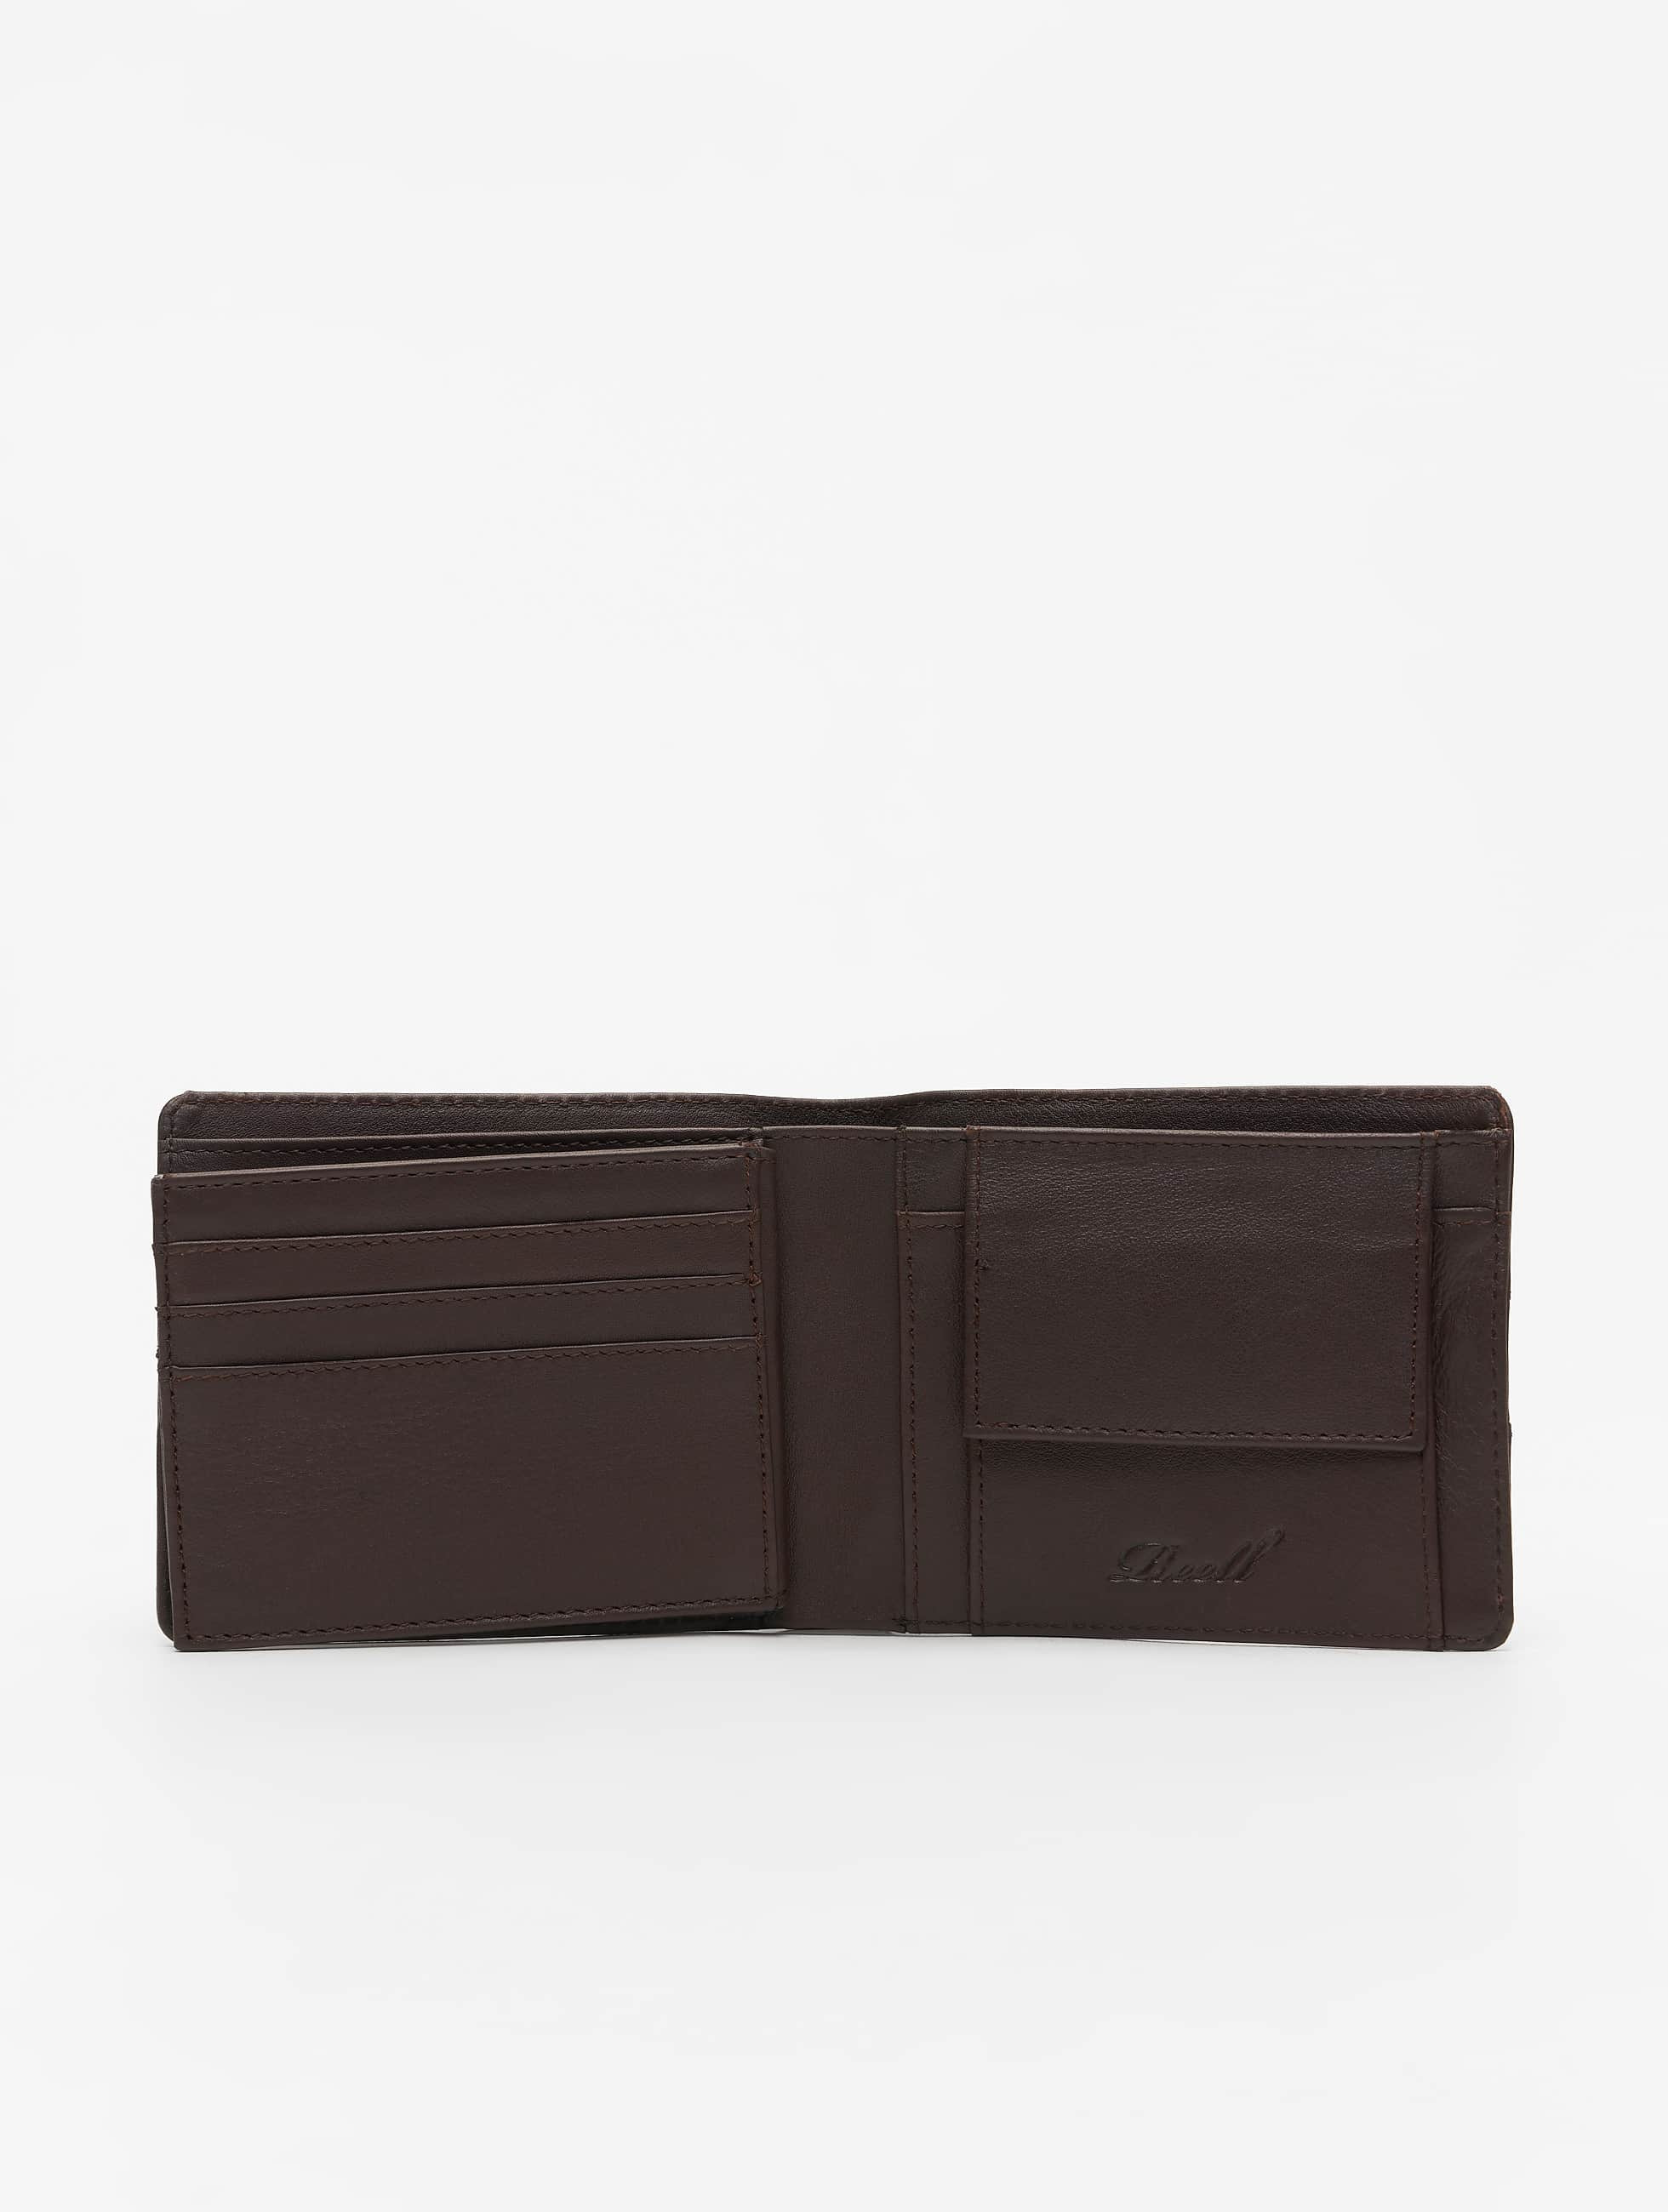 Reell Jeans Кошелёк Strap Leather коричневый